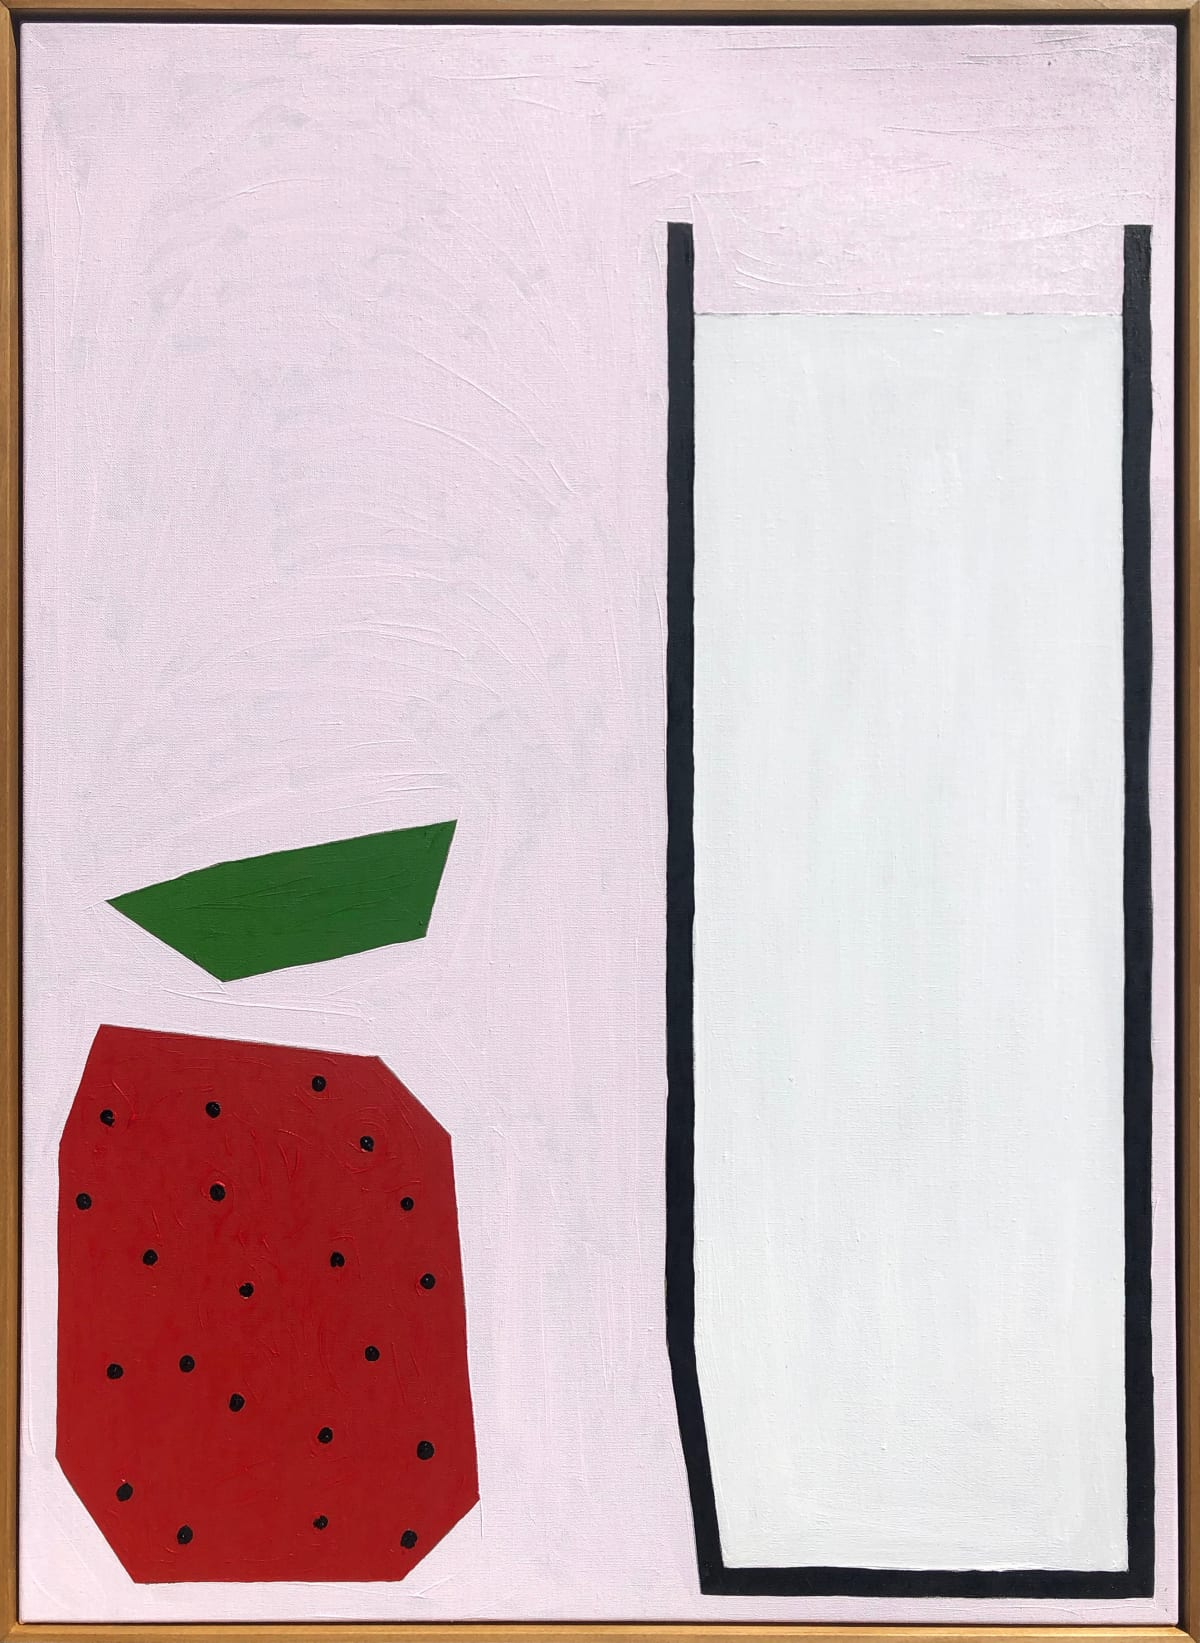 Bertrand Fournier, Strawberry Milk, 2019